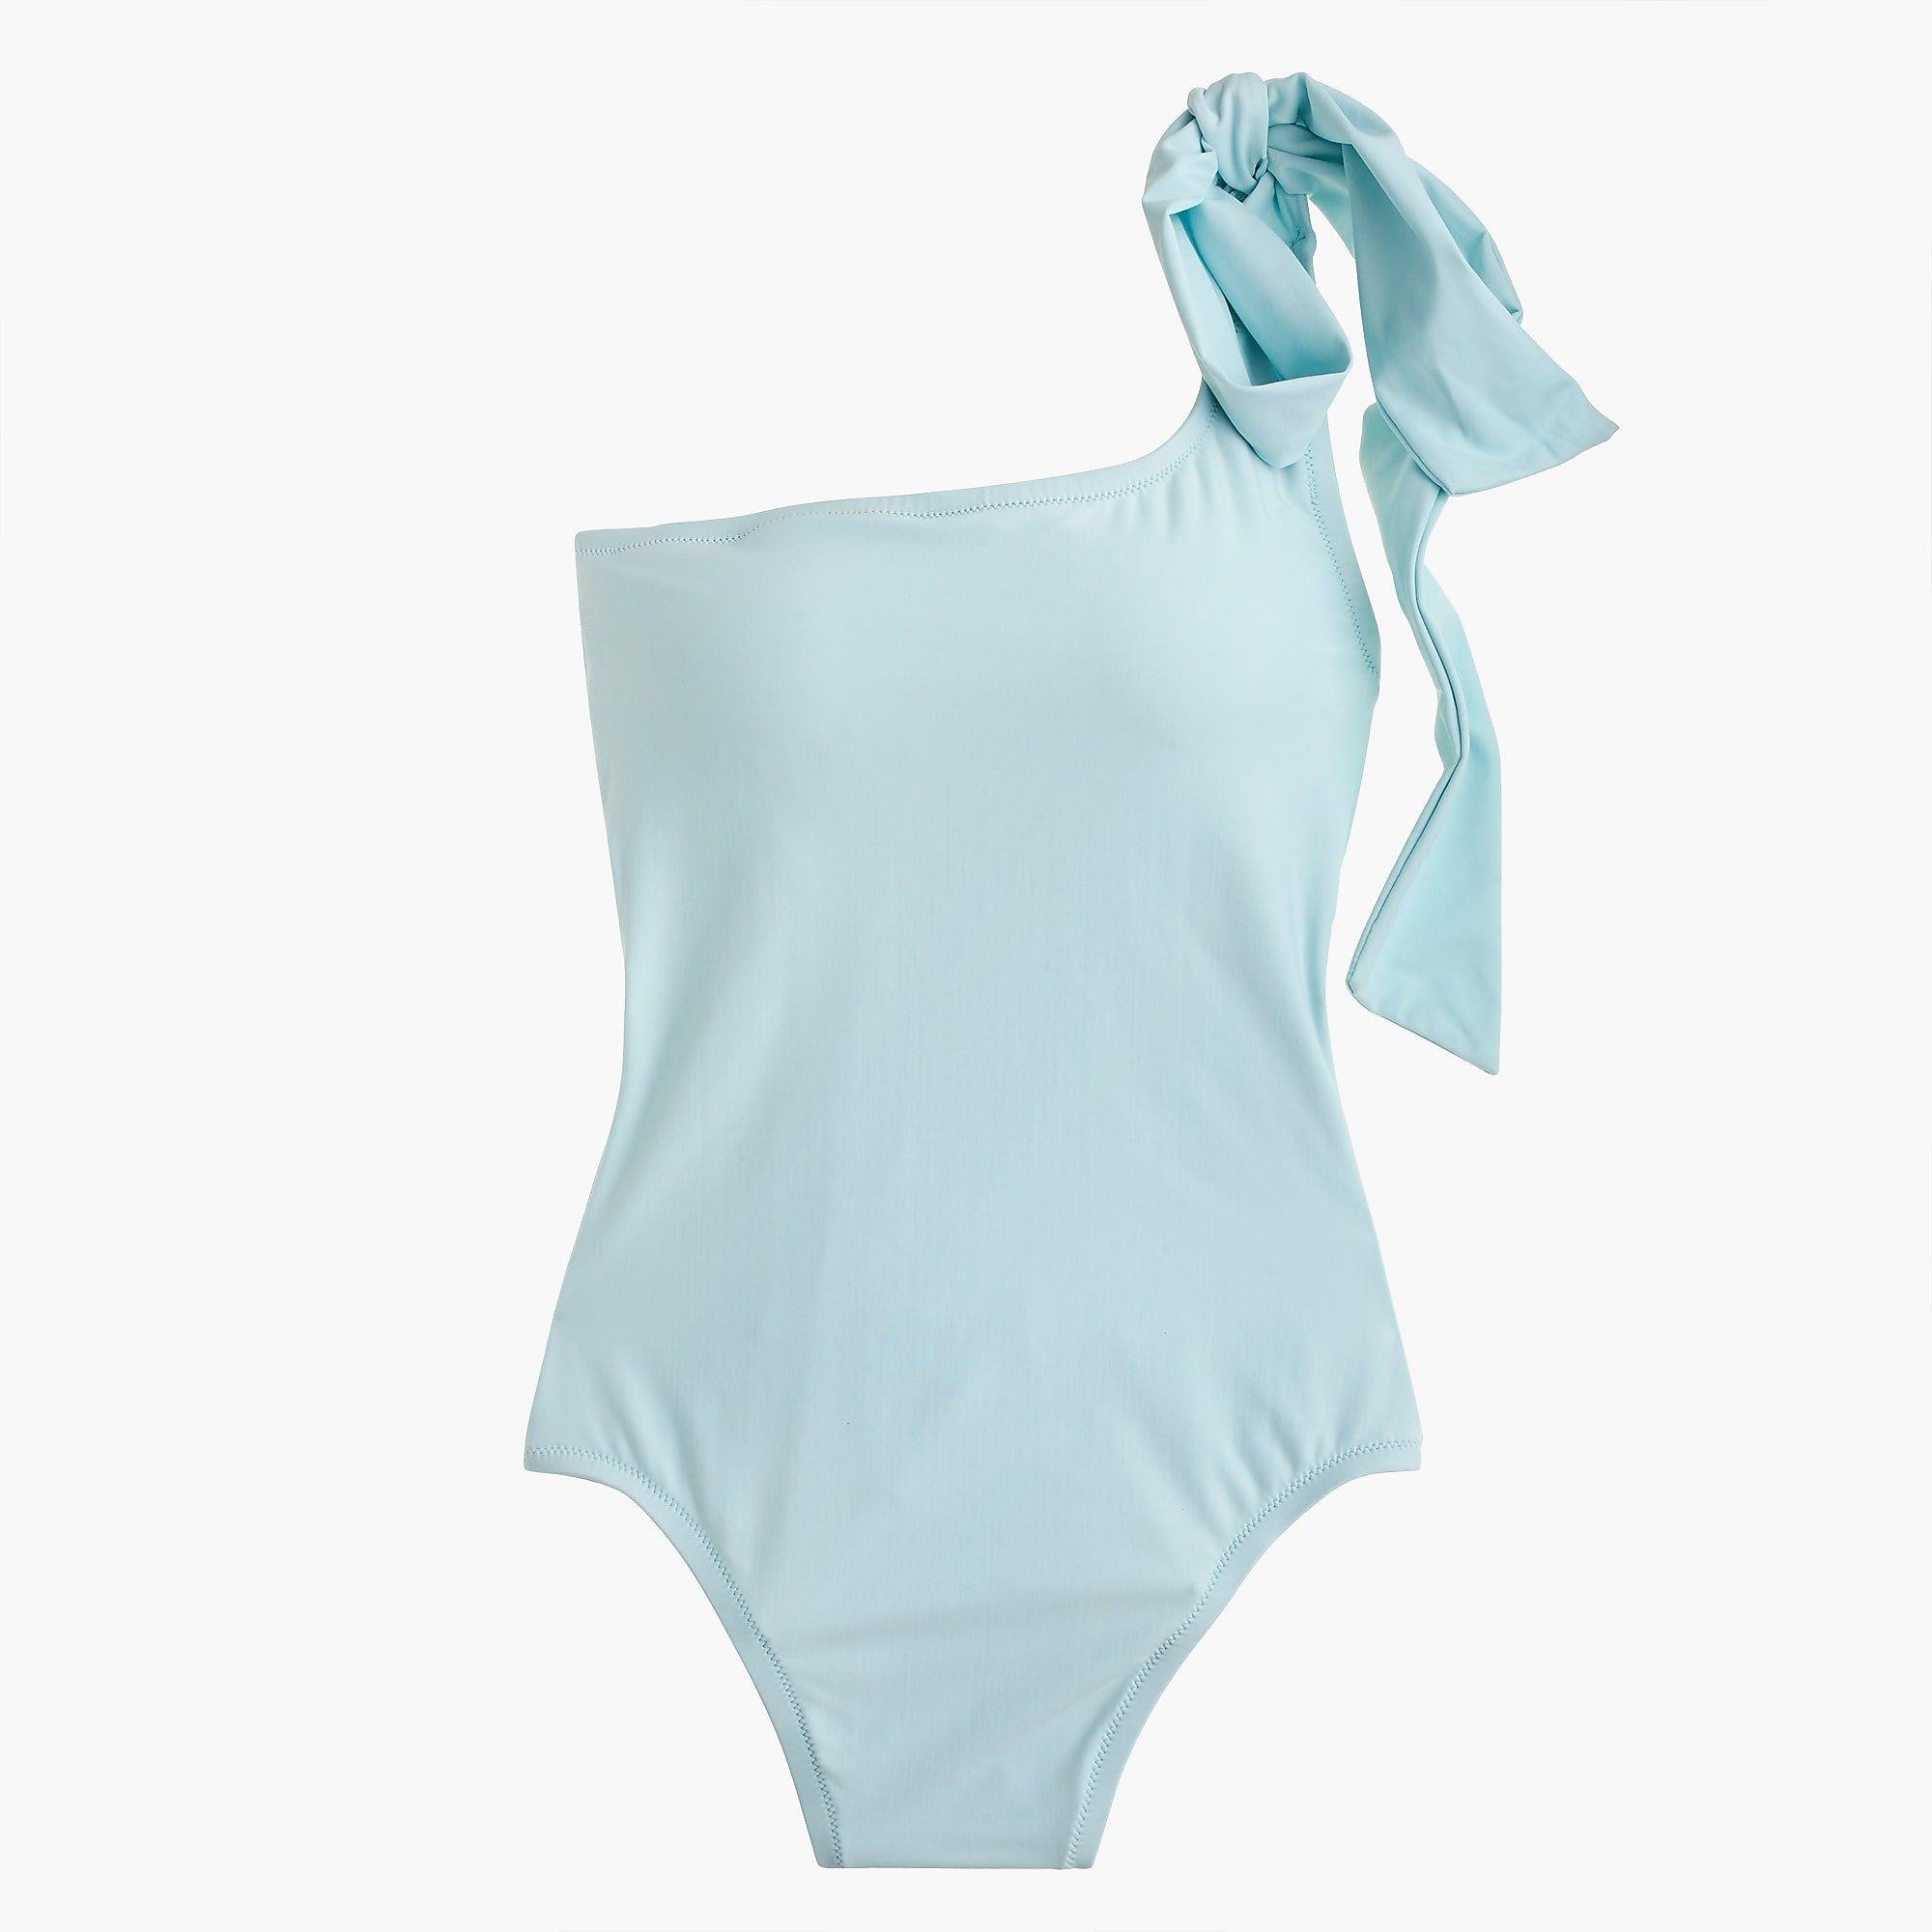 c77b3ed6855b8 Women's Bow-Tie One-Shoulder One-Piece Swimsuit - Women's Swimwear   J.Crew